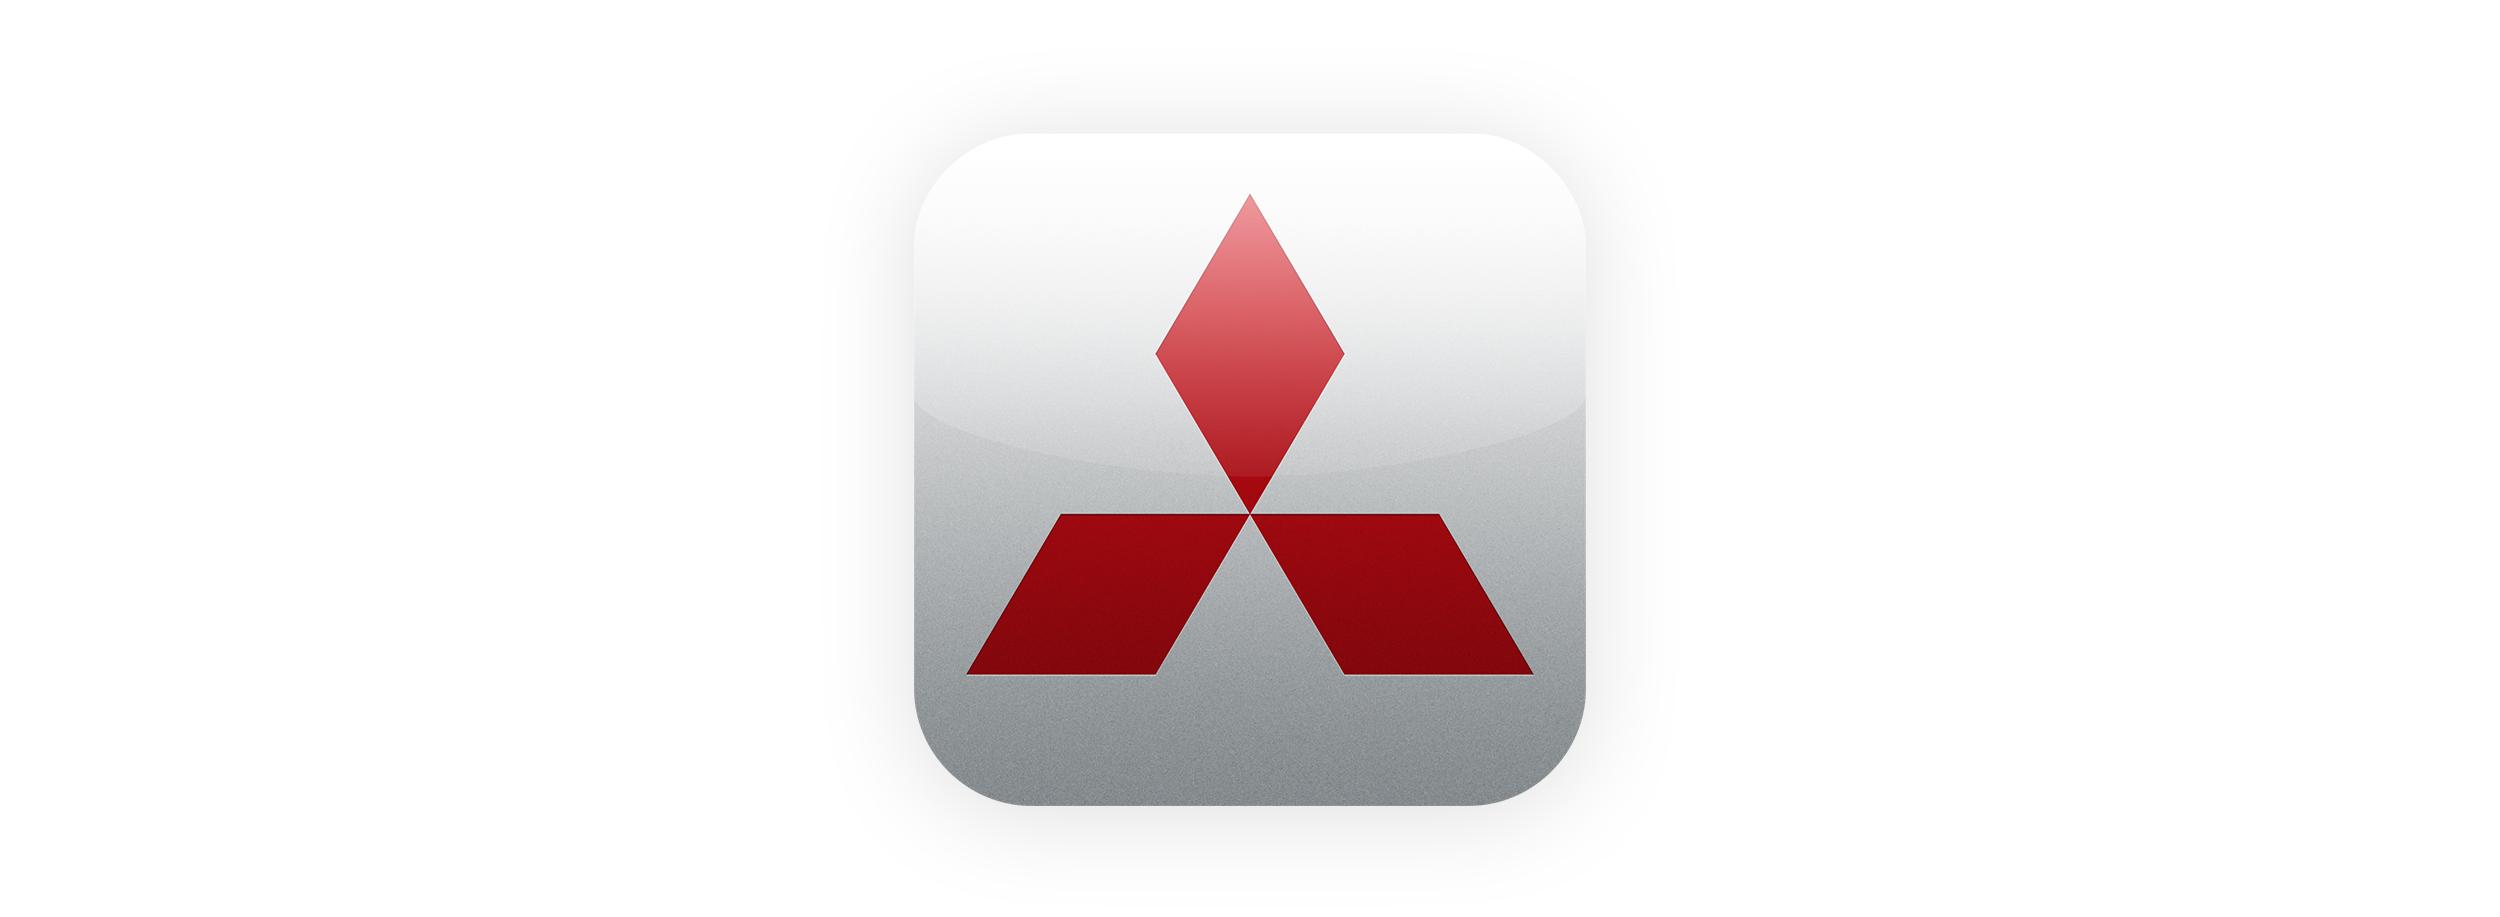 The app icon.